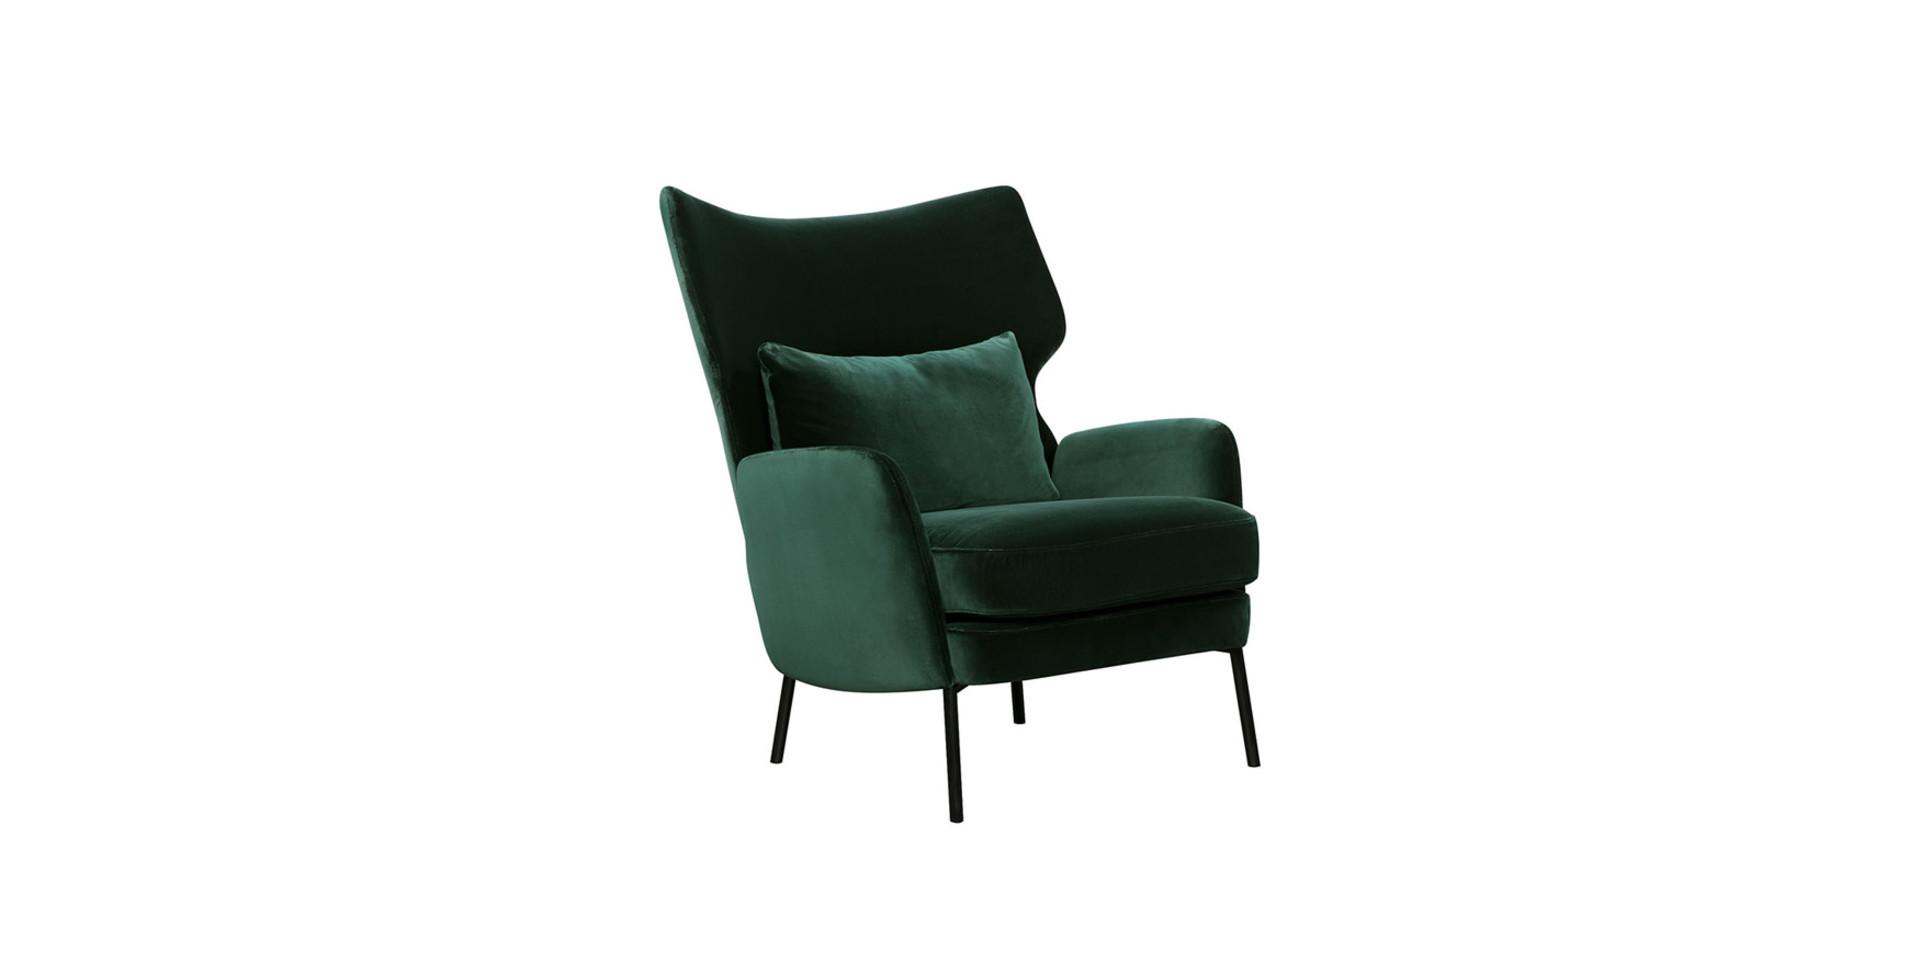 ALEX_armchair_lario1402_dark_green_black_legs_2